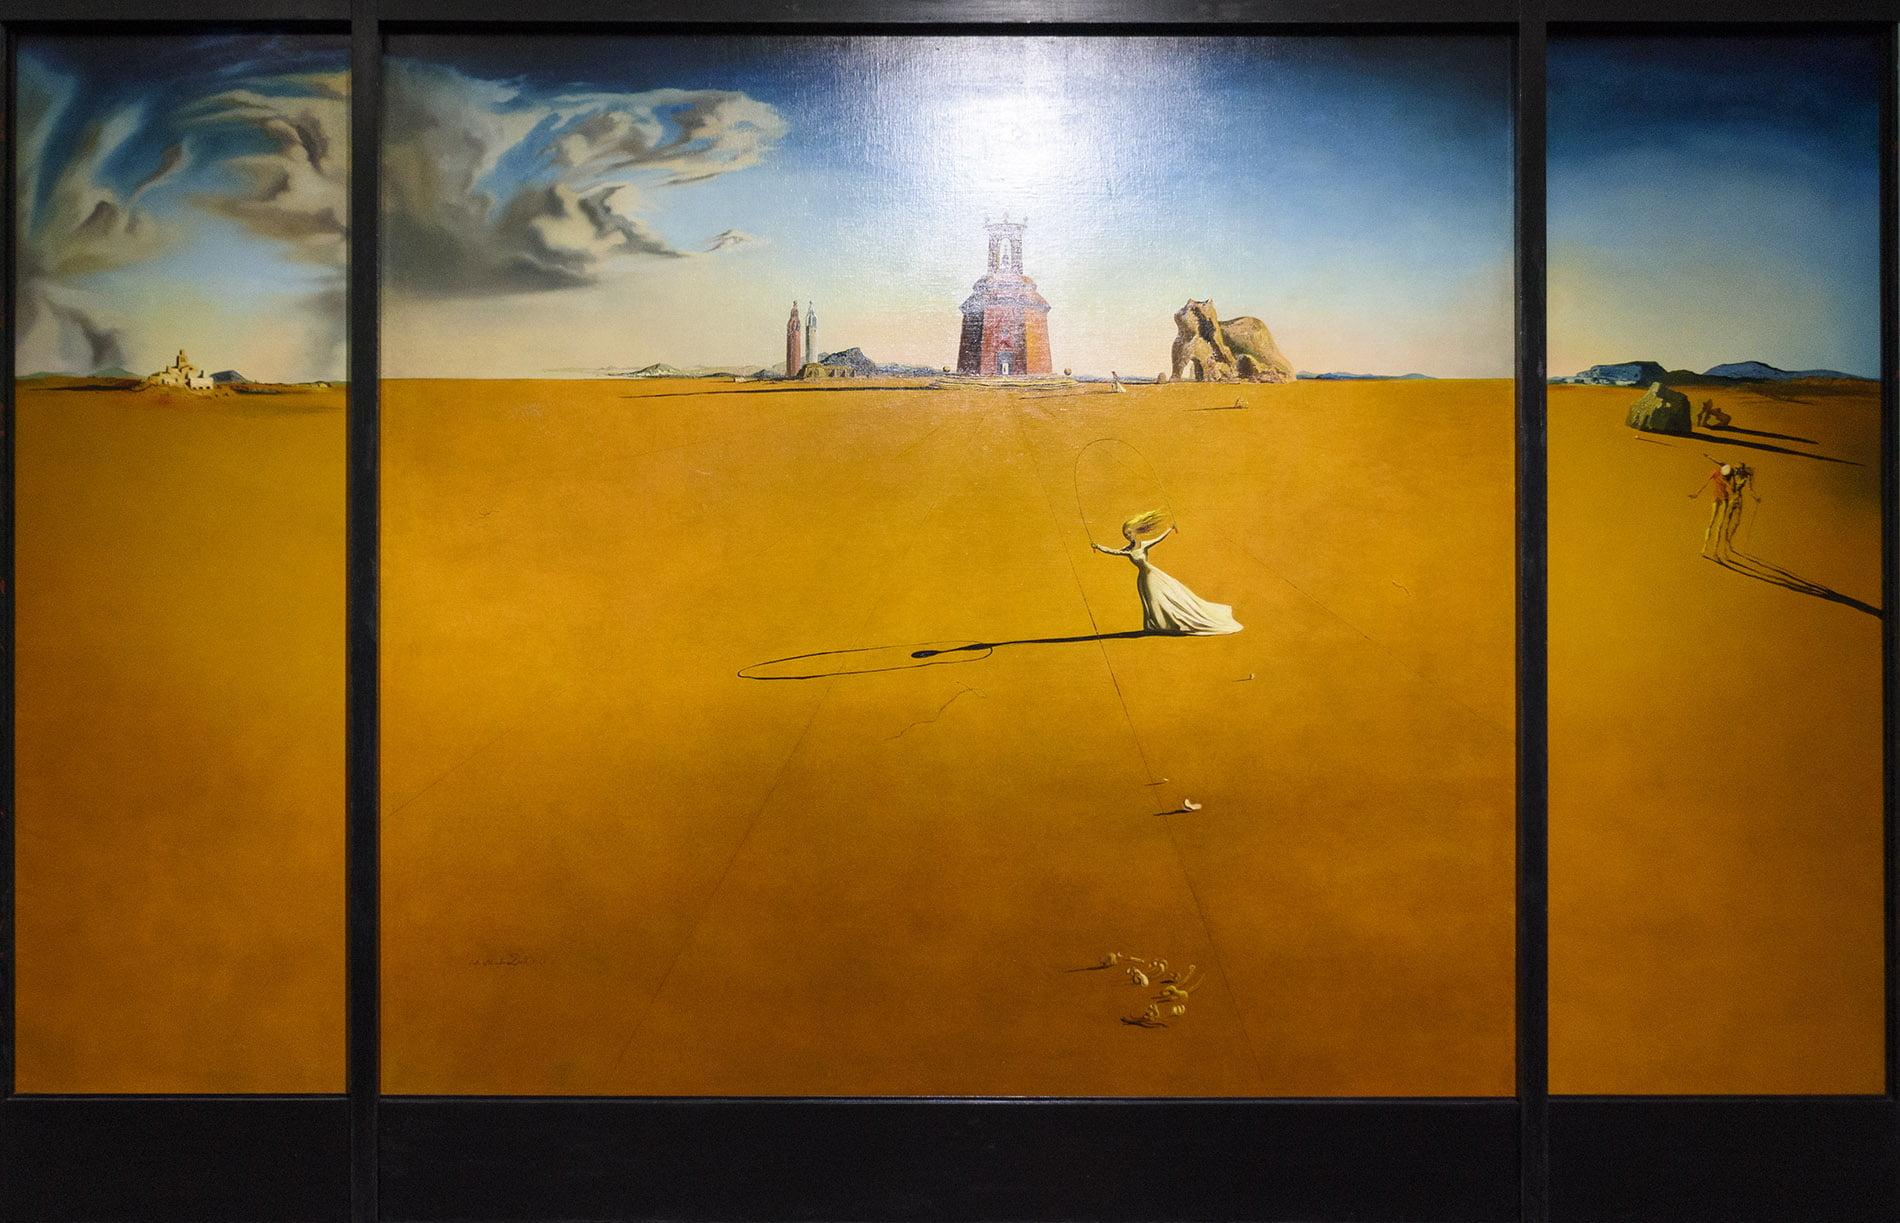 Museum Boijmans van Beuningen, Rotterdam, Dalí, Surrealism